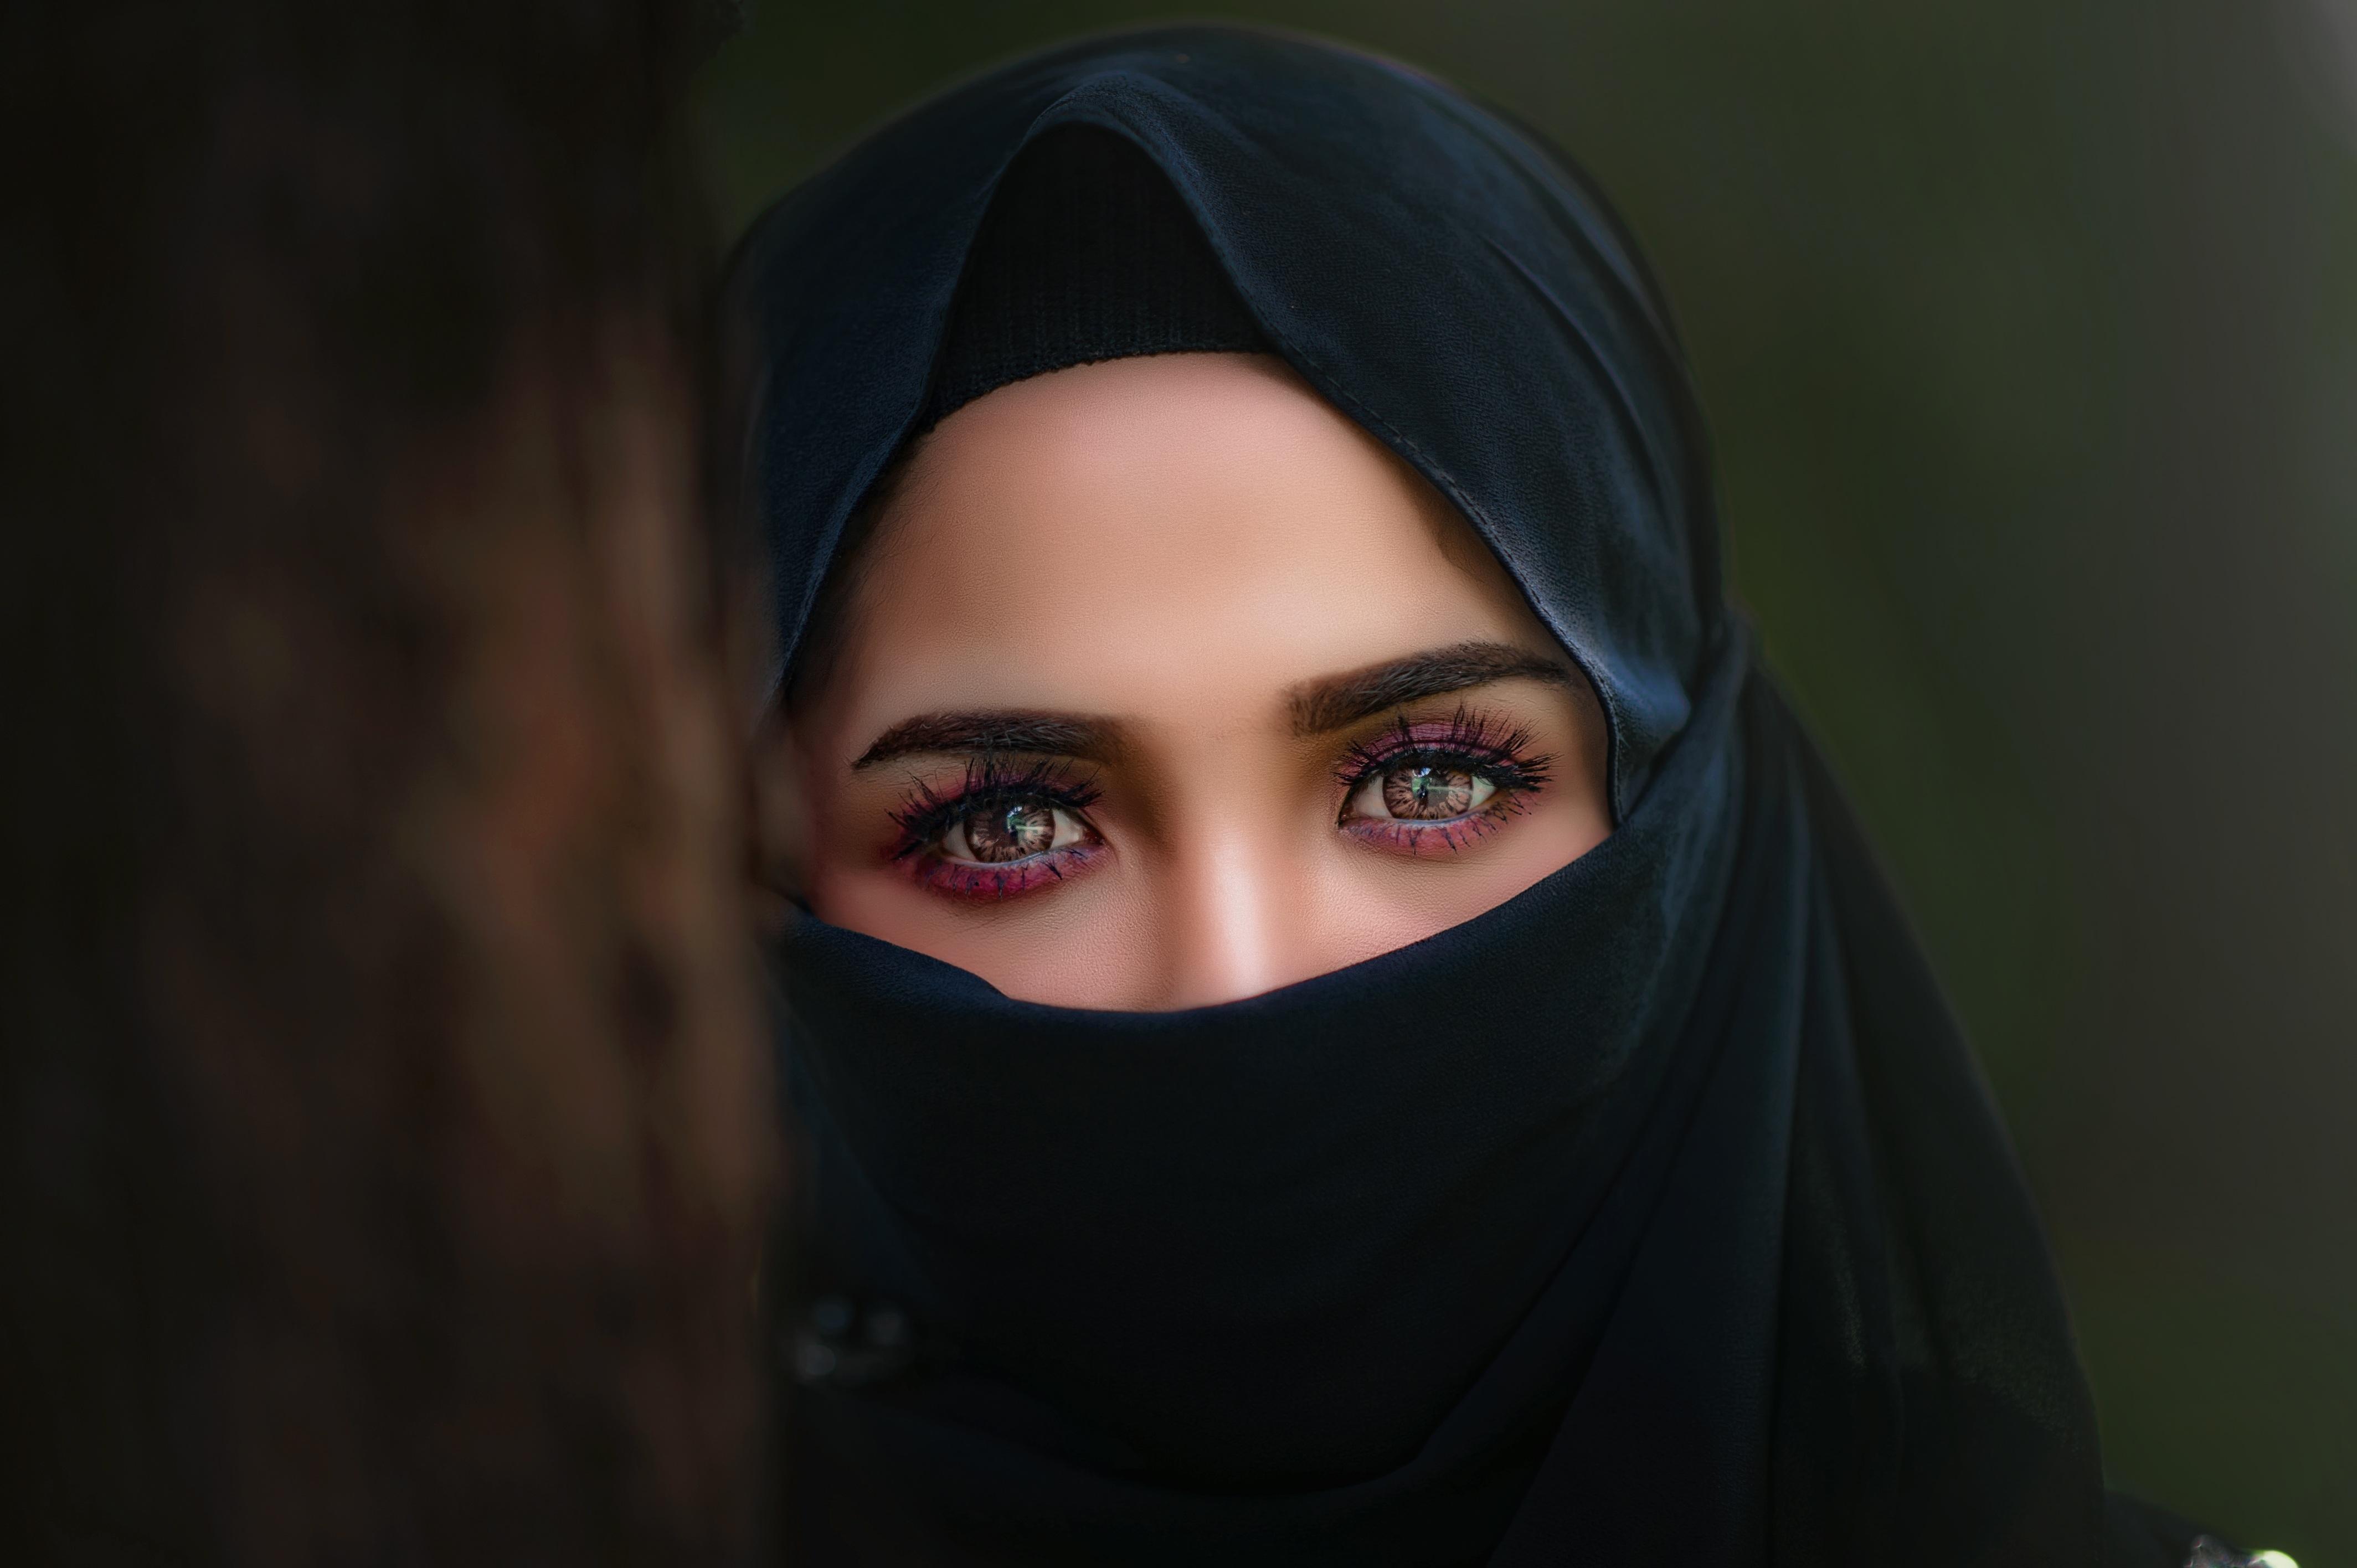 fileportrait in hijab 3064633jpg wikimedia commons